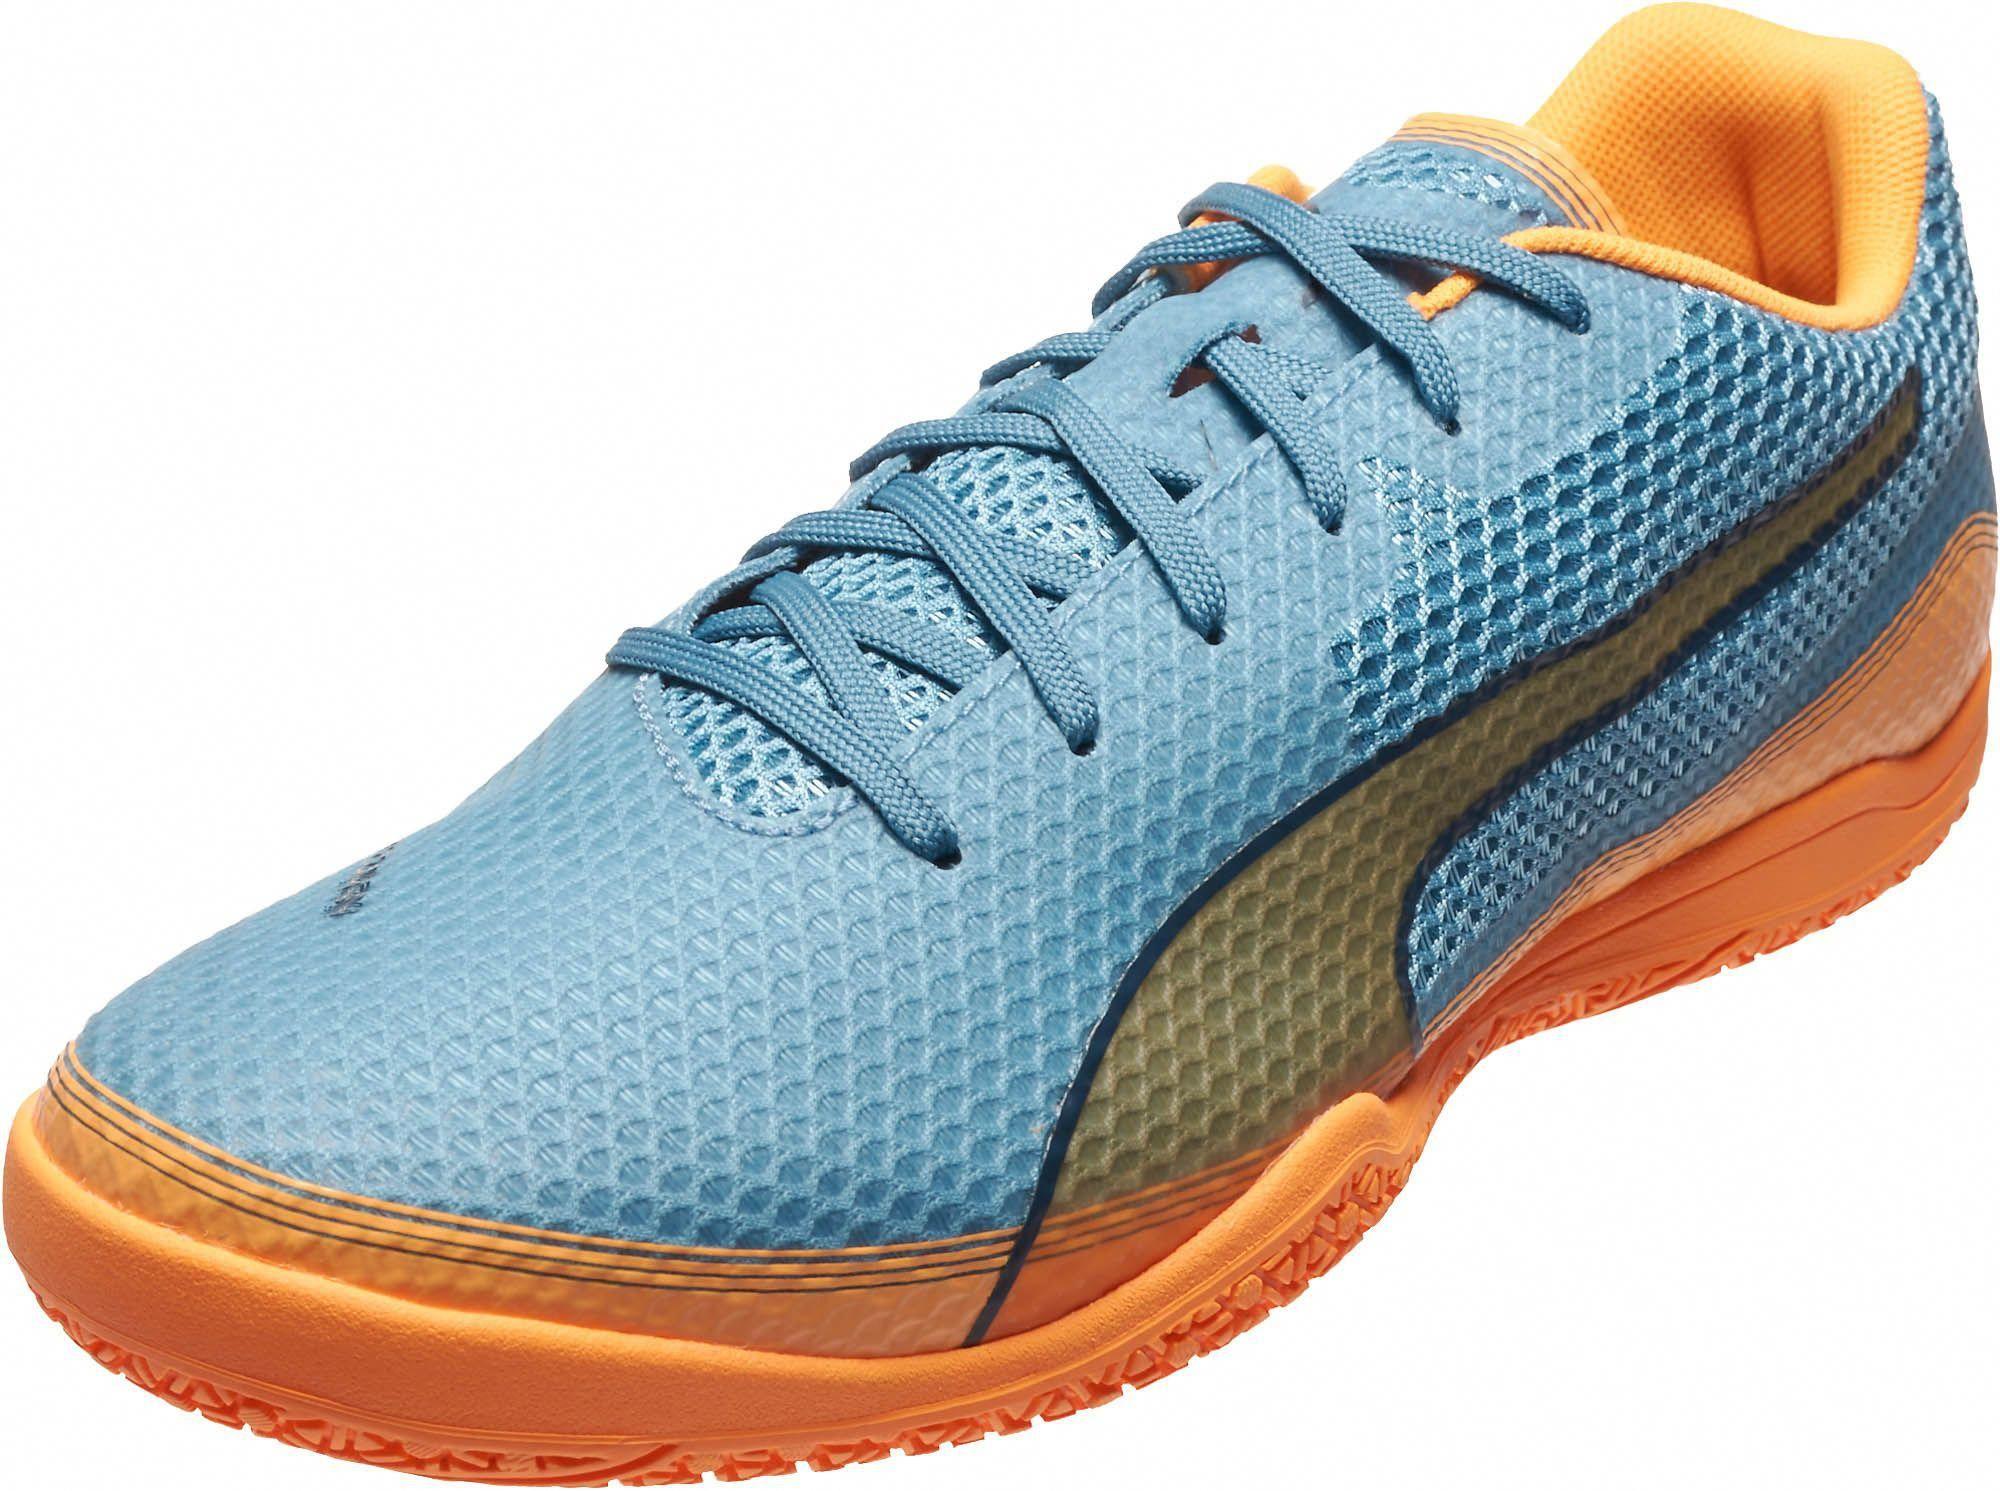 b03c01a6da7196 Puma Invicto Fresh Sala indoor soccer shoes. Buy it from SoccerPro.   indoortennis